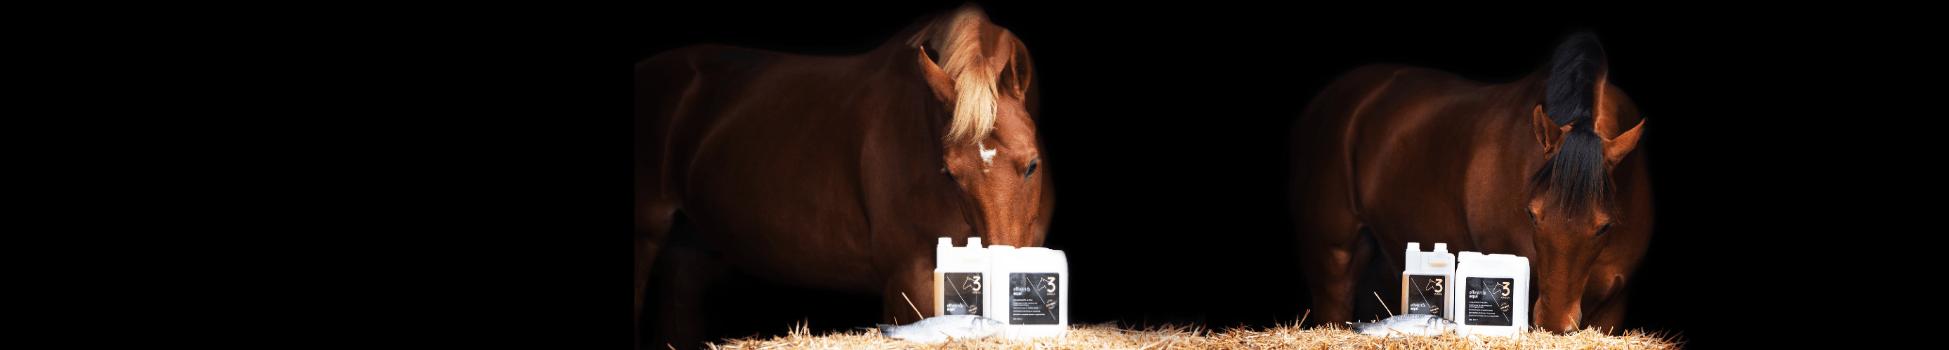 Horses effektri vis olie Effektri